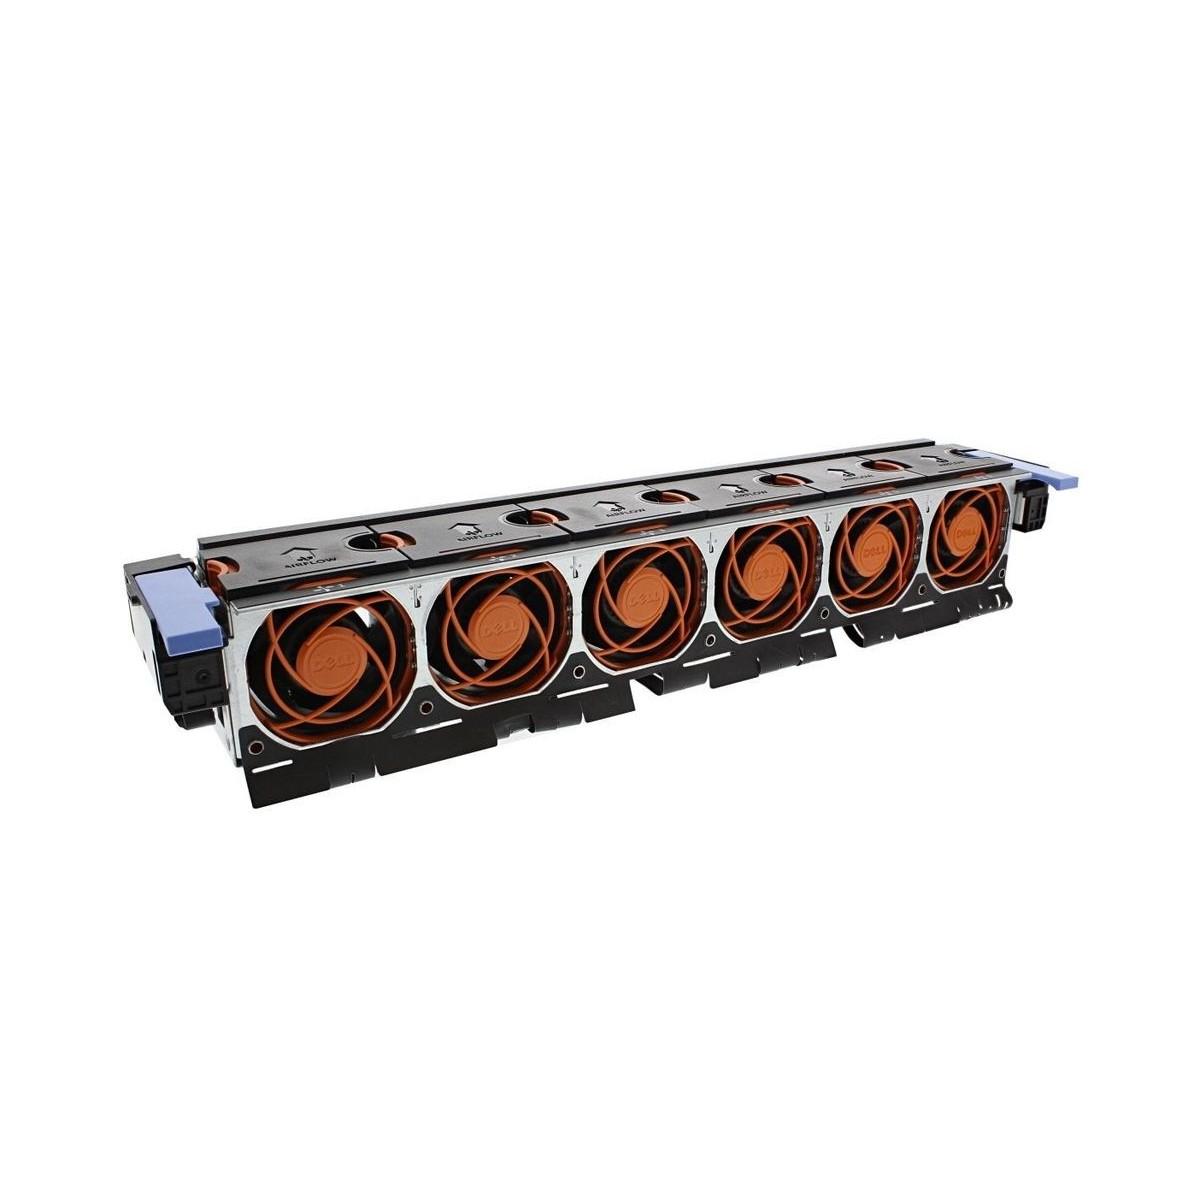 KABEL HP SATA OPTICAL DRIVE 1,2m DL380 G6 484355-003